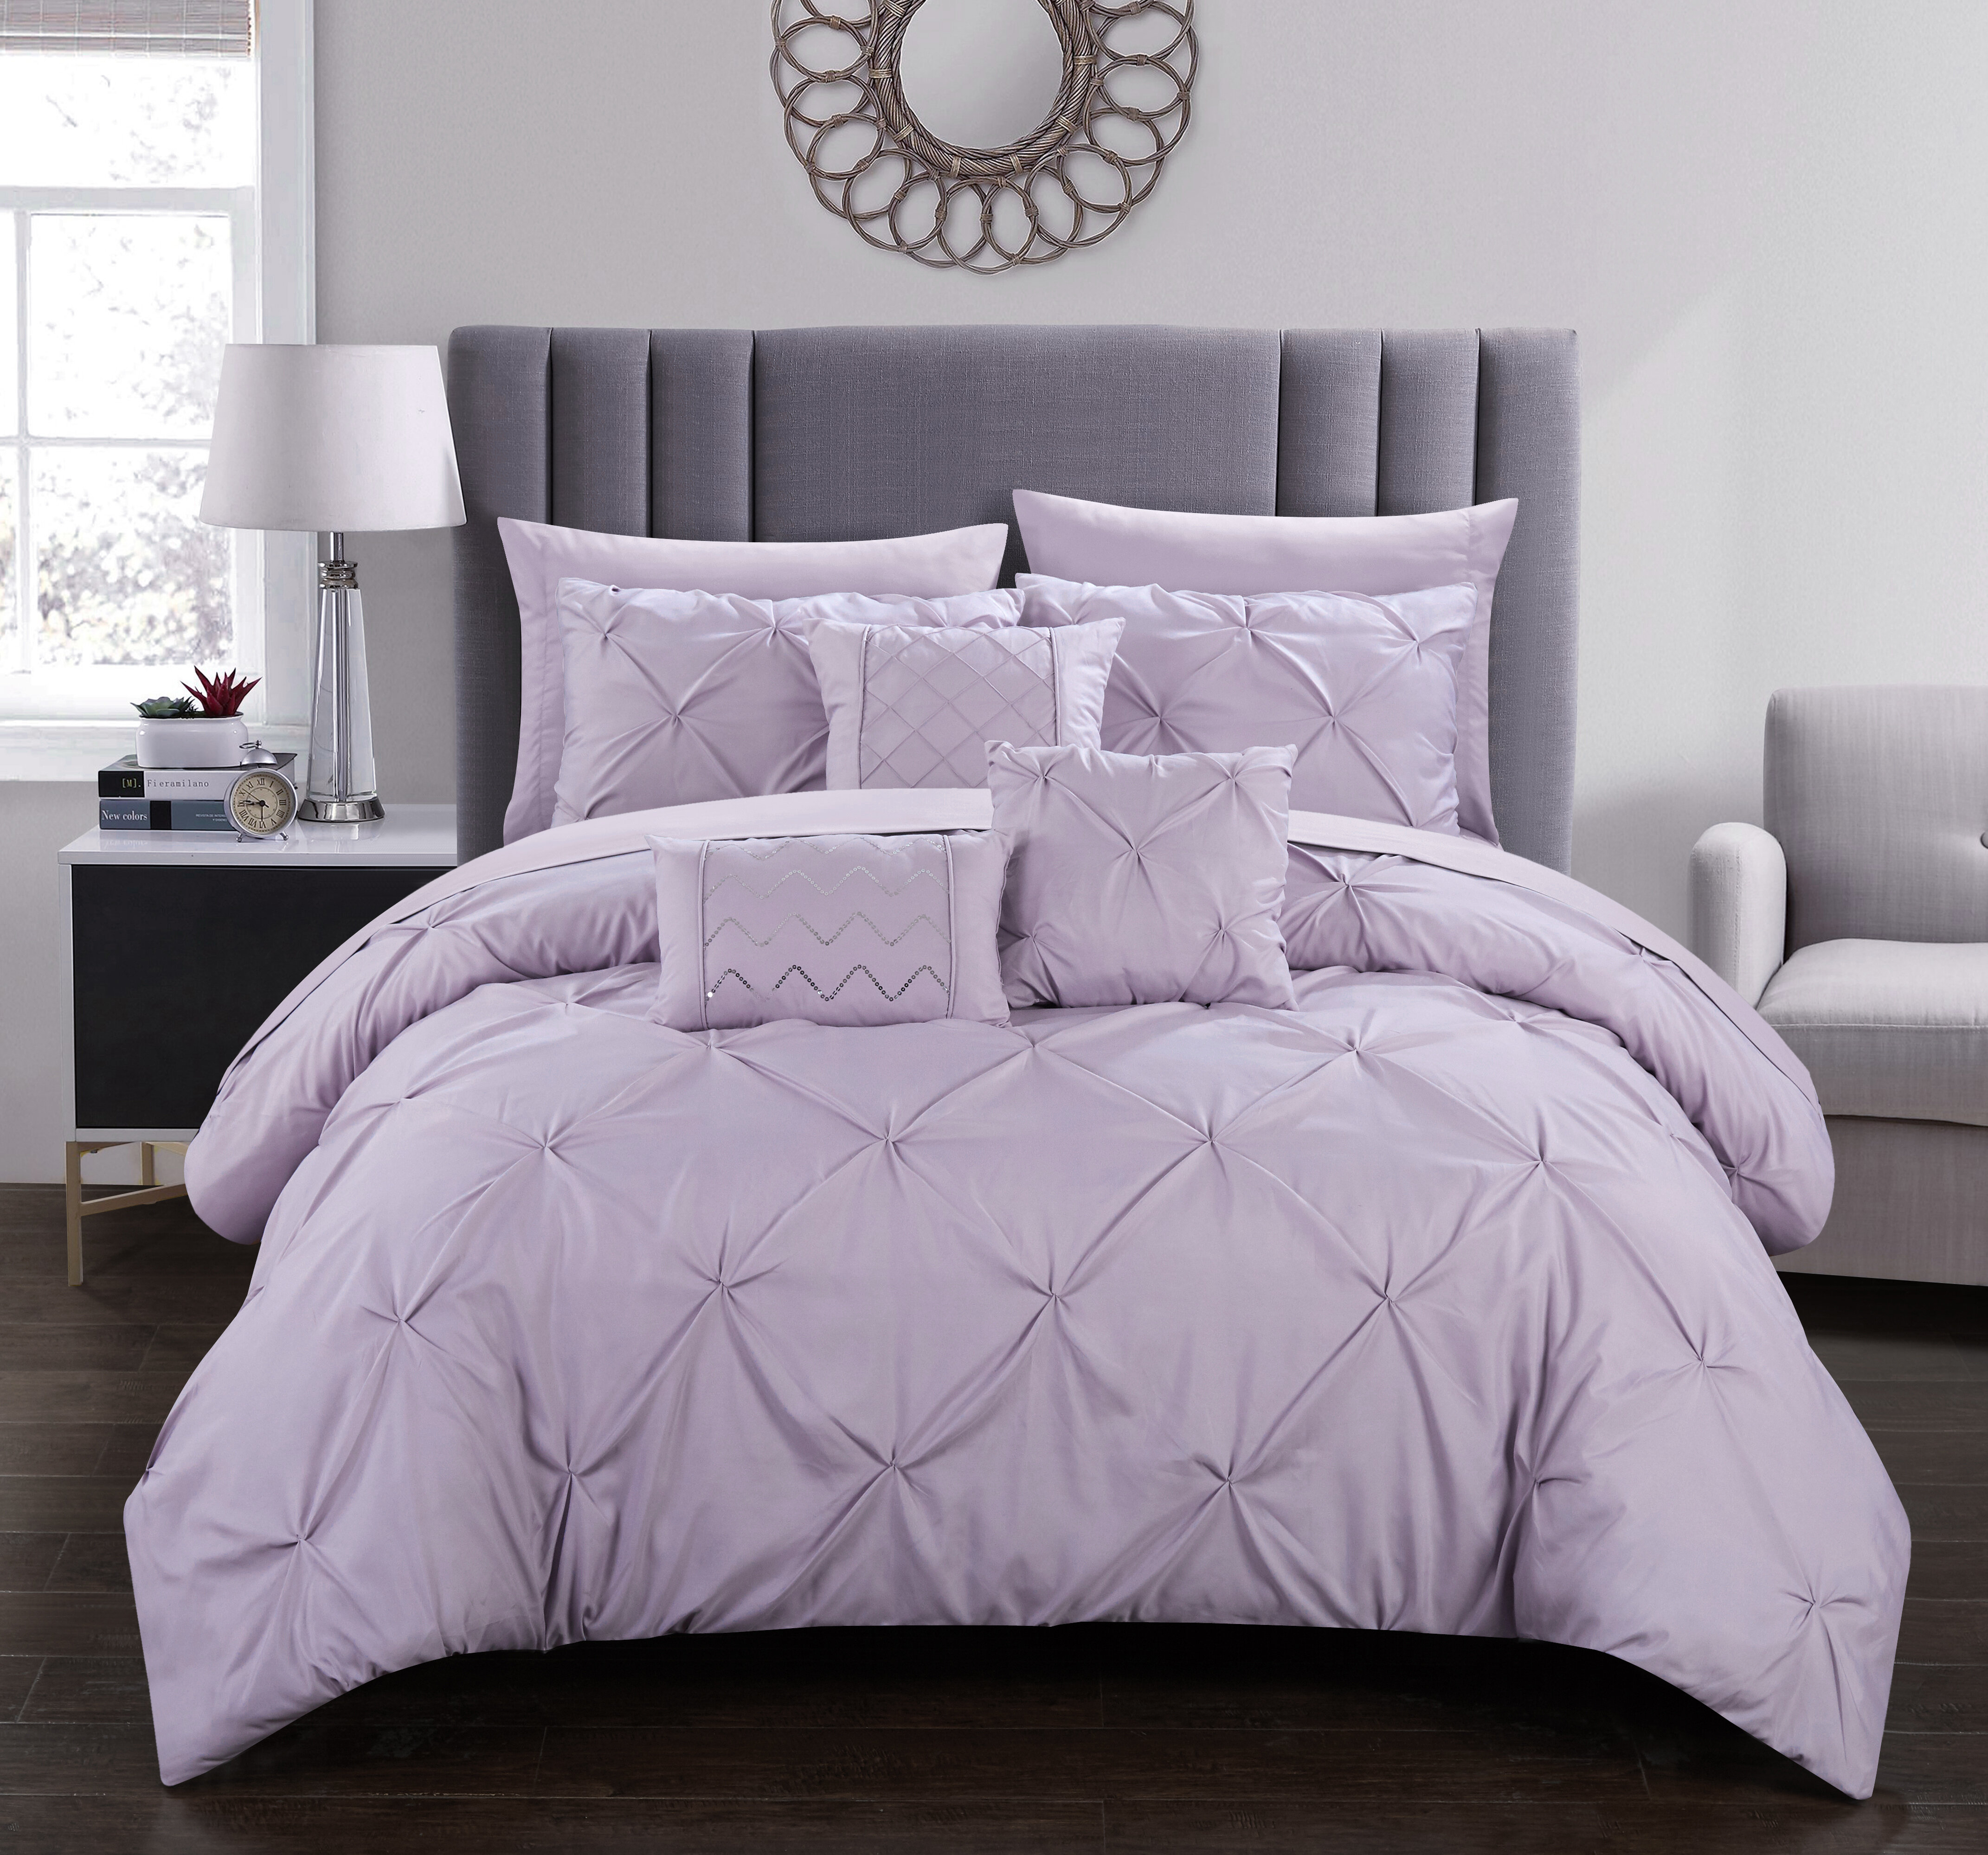 Willa Arlo Interiors Karyn 10 Piece Comforter Set Reviews Wayfair